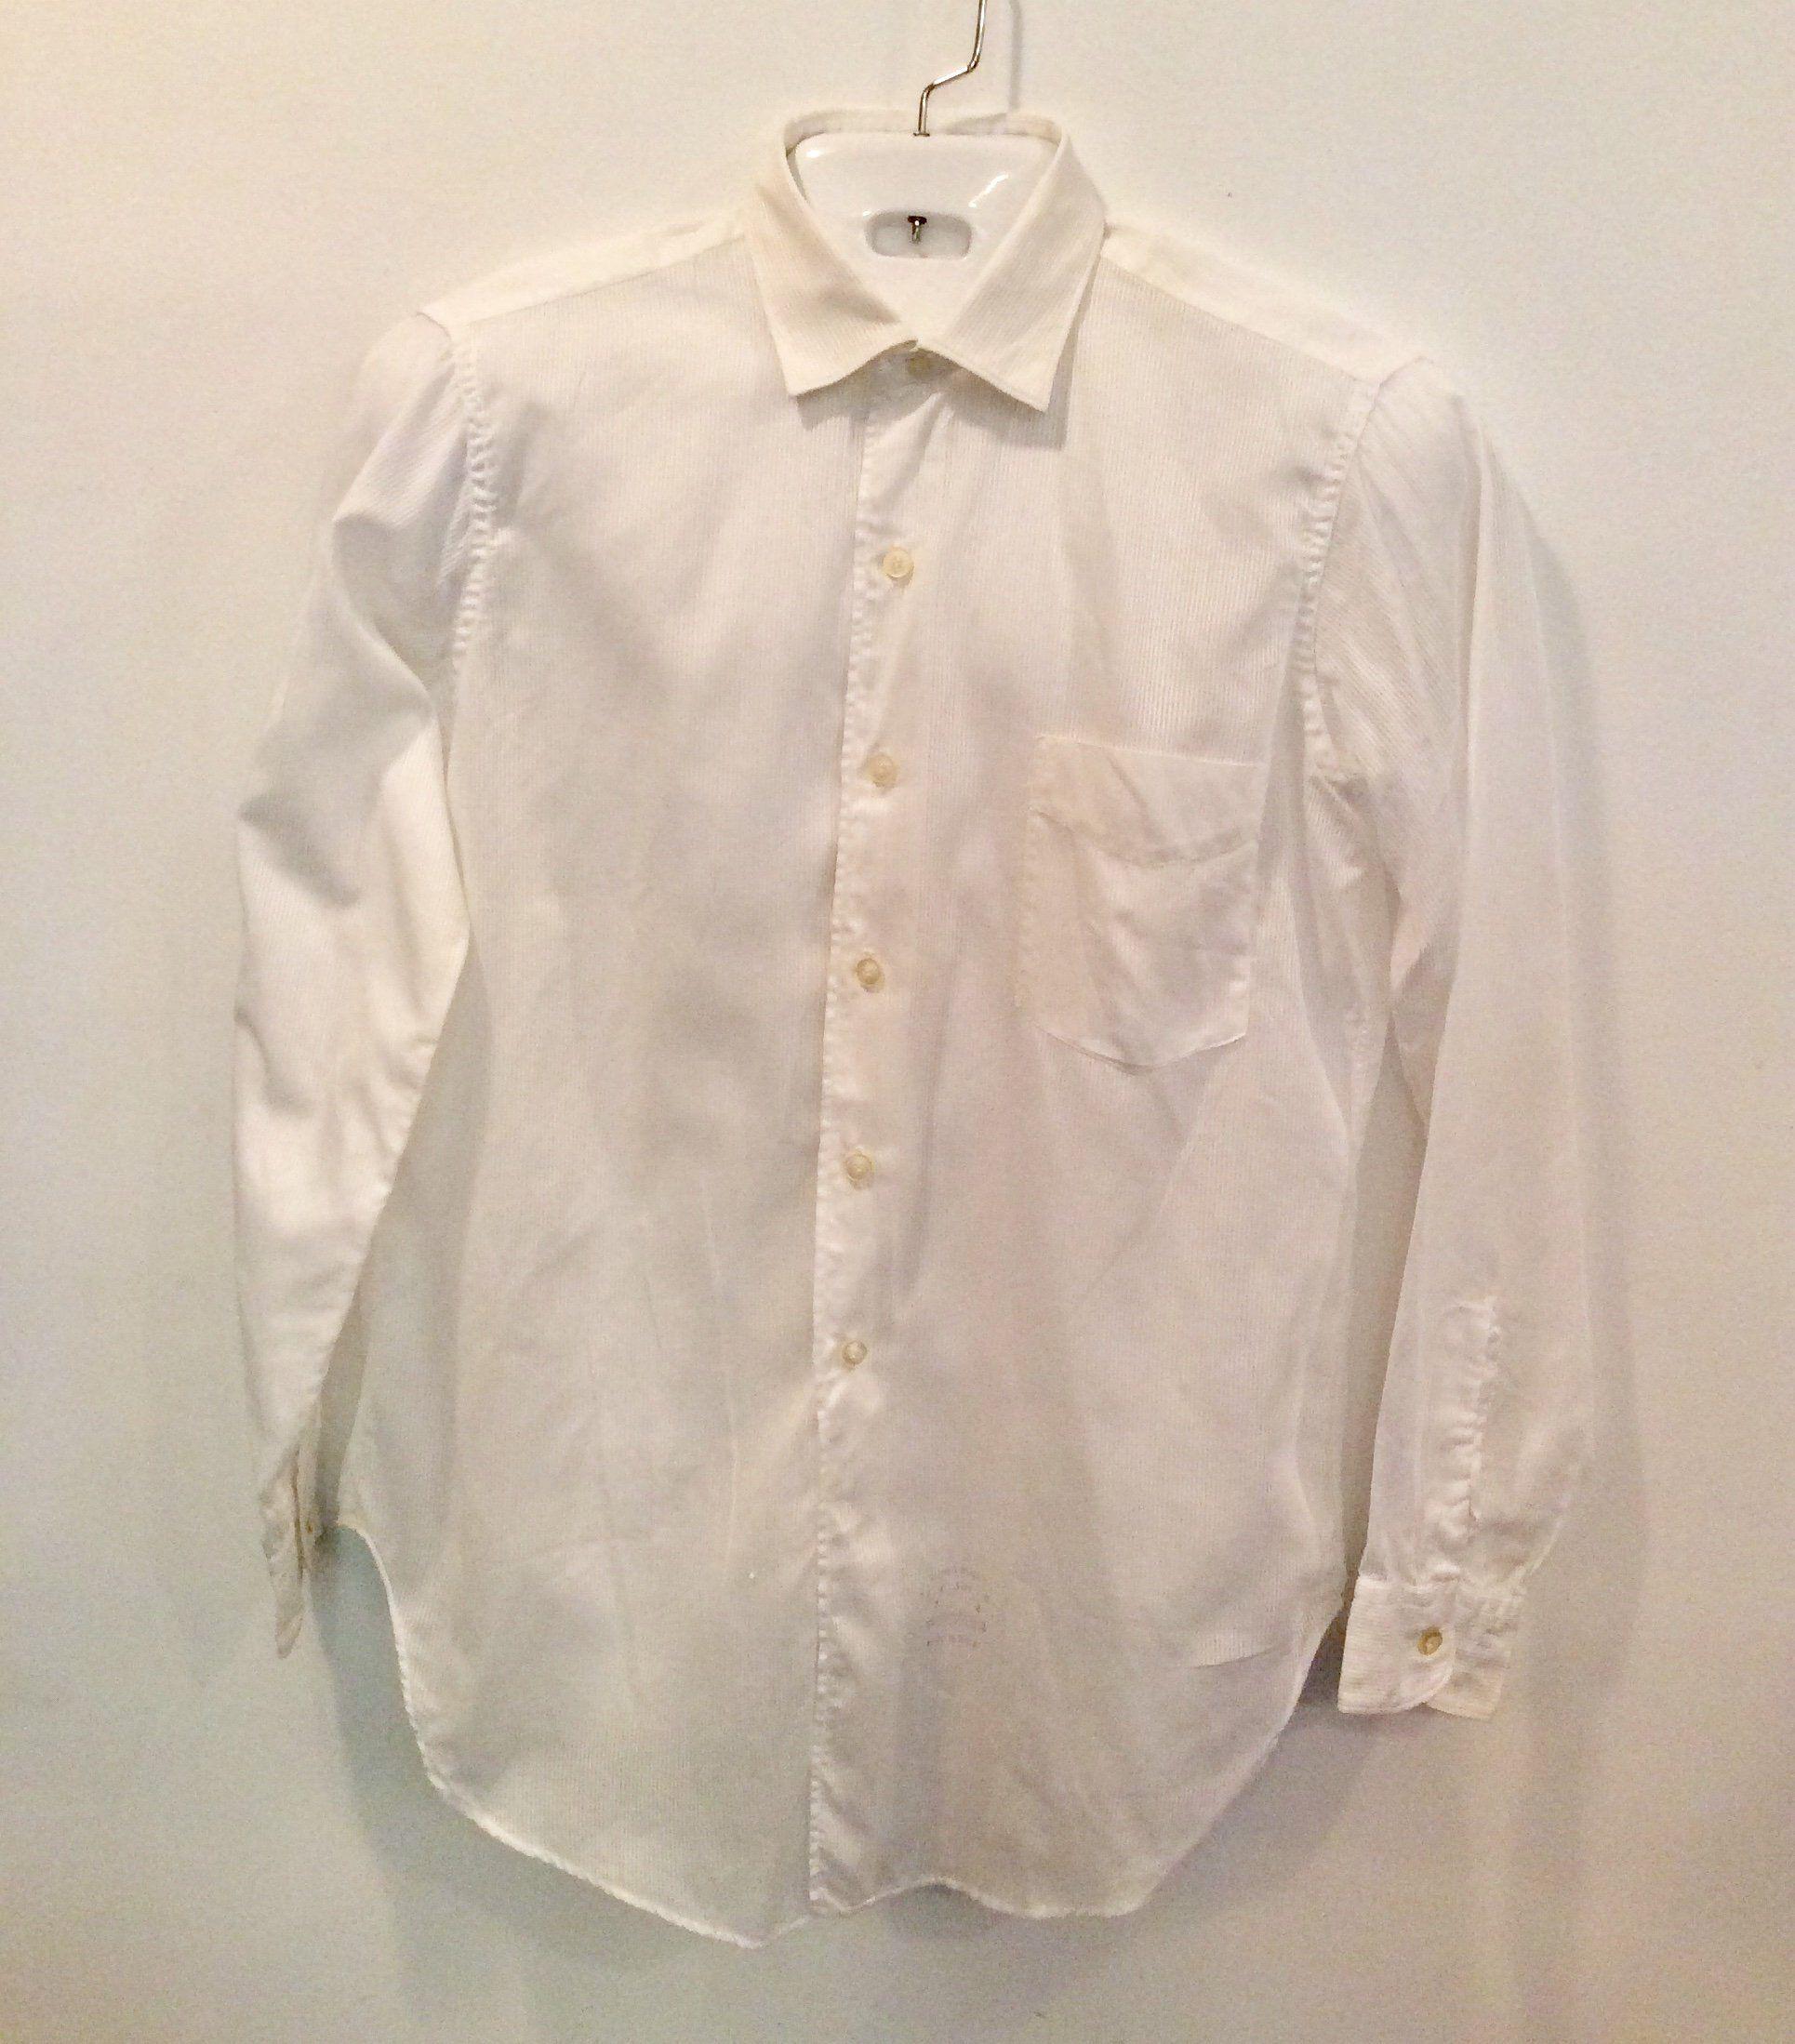 Vintage 1950s Mens Shirt Manhattan Koolpeek White Dress Shirt Etsy White Oxford Shirt Men White Dress Mens Shirt Dress